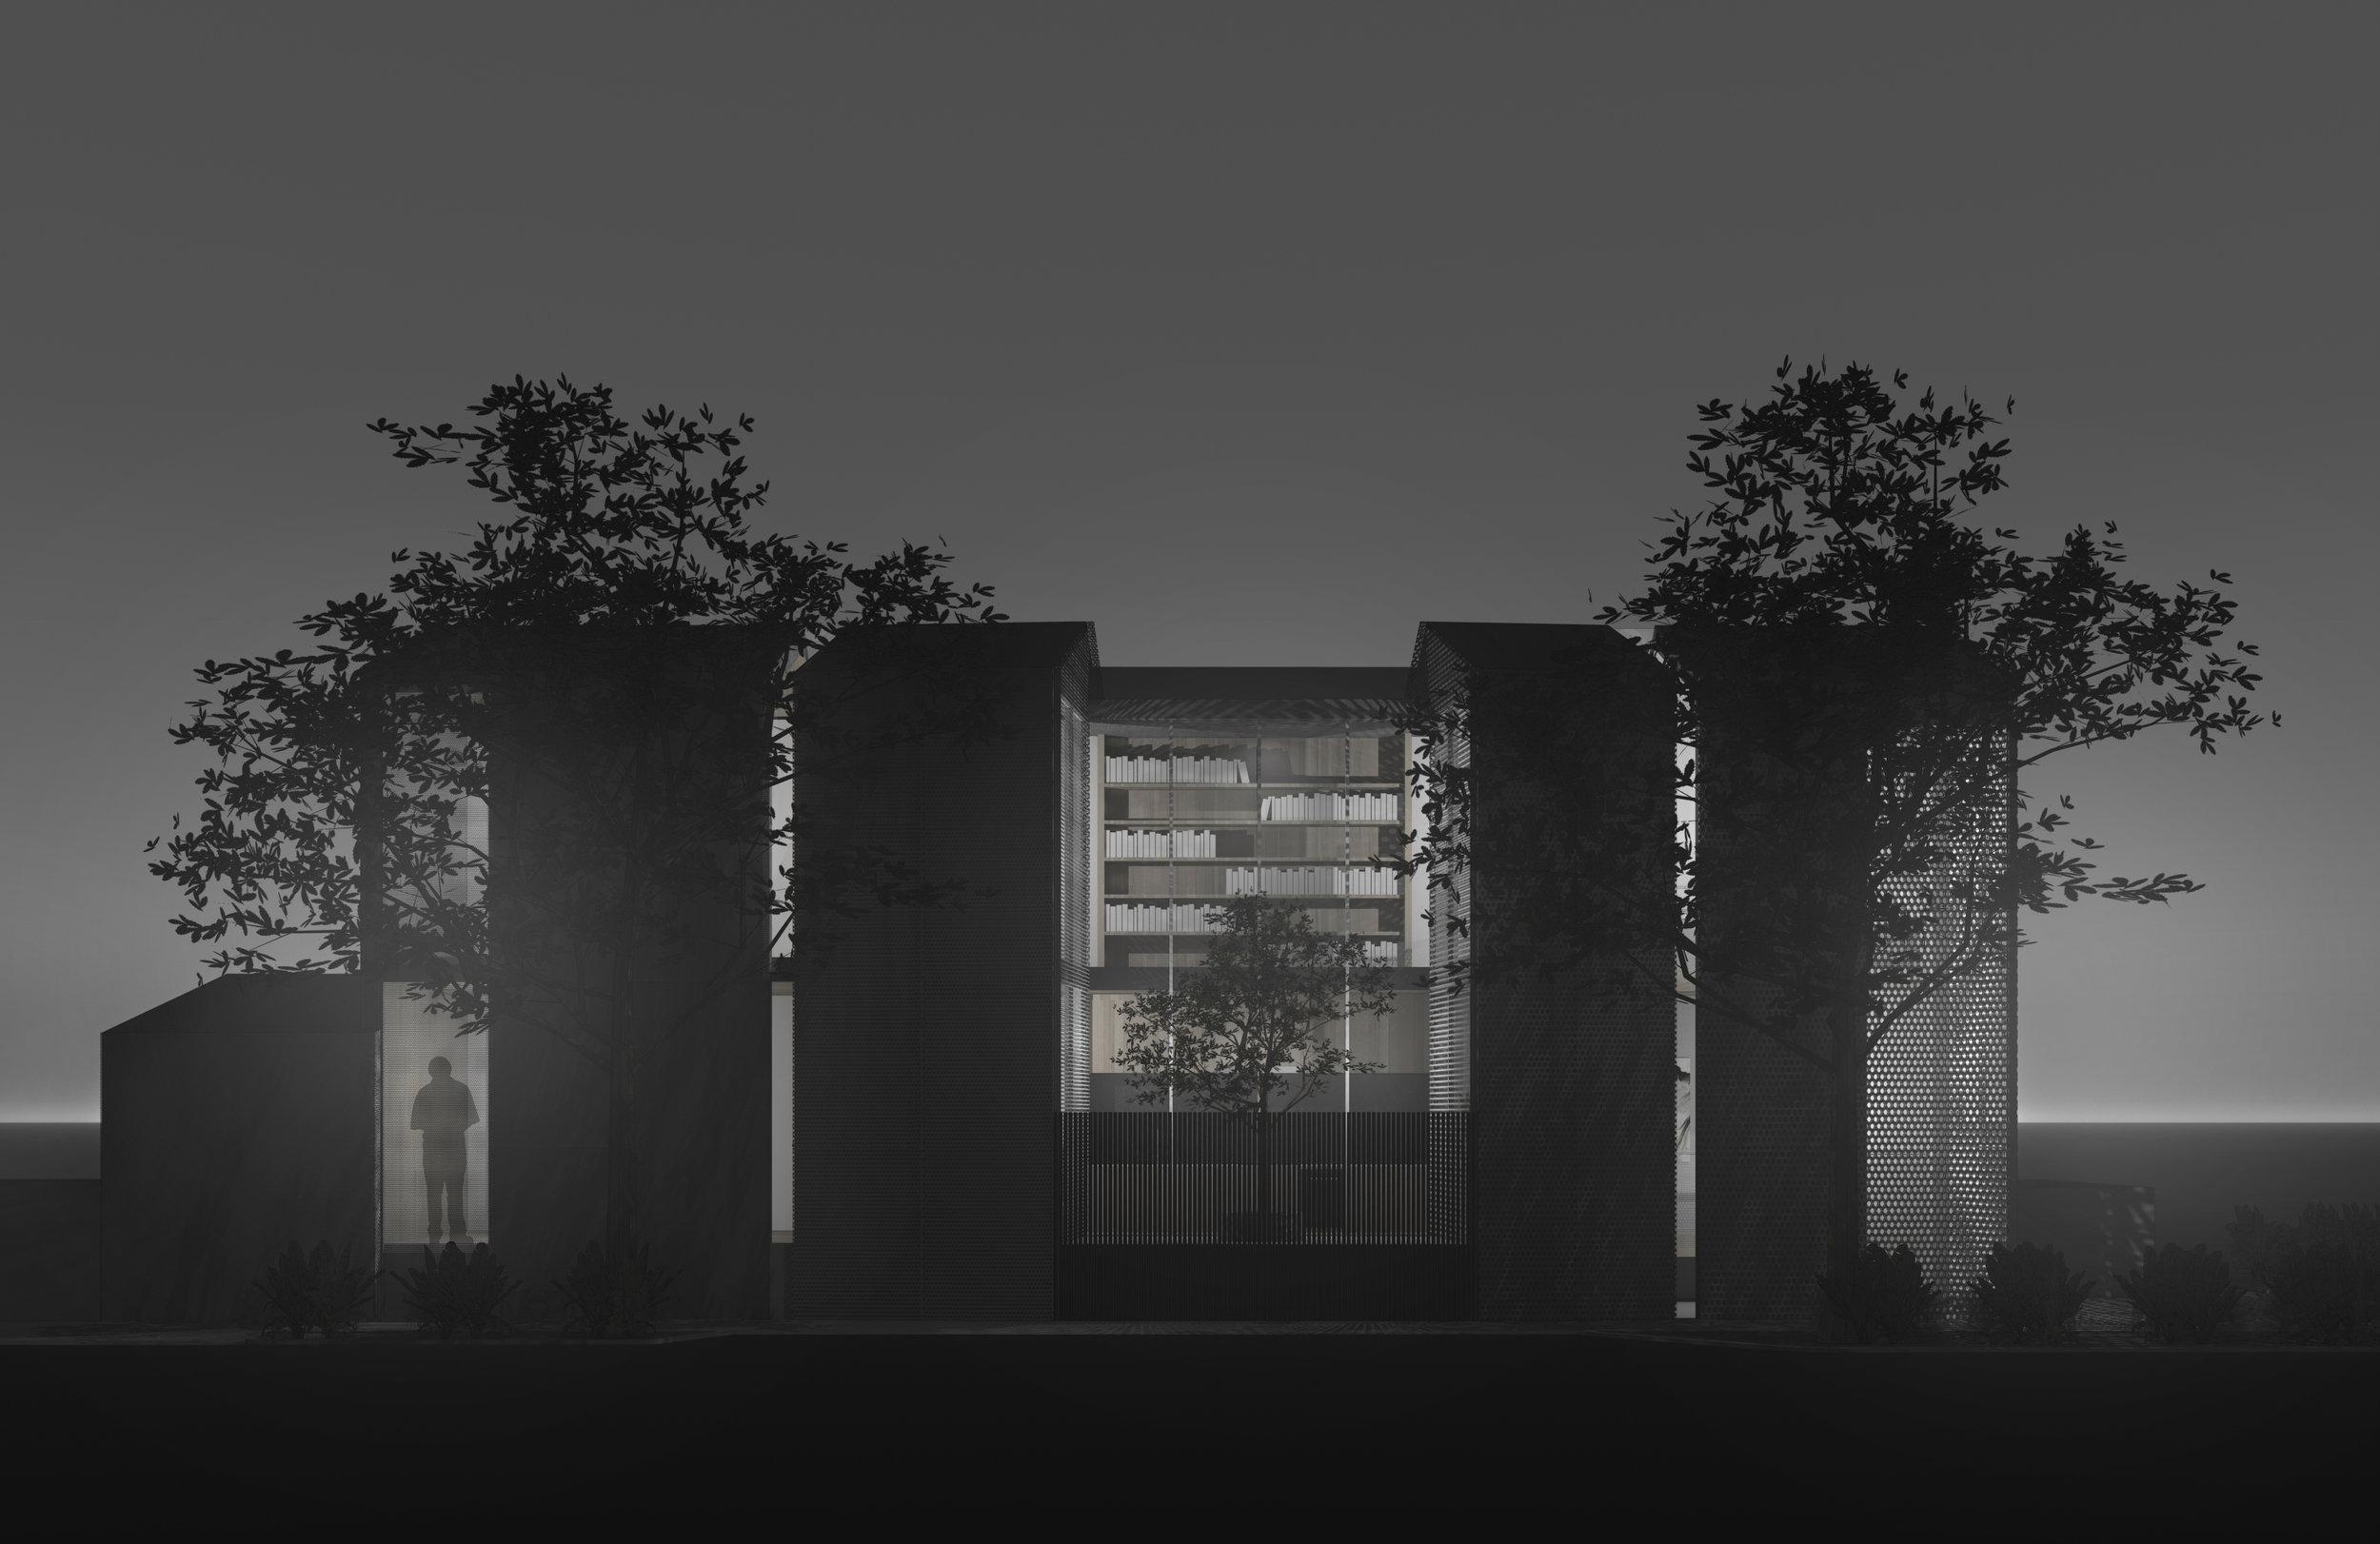 Exterior2 - Crop.jpg